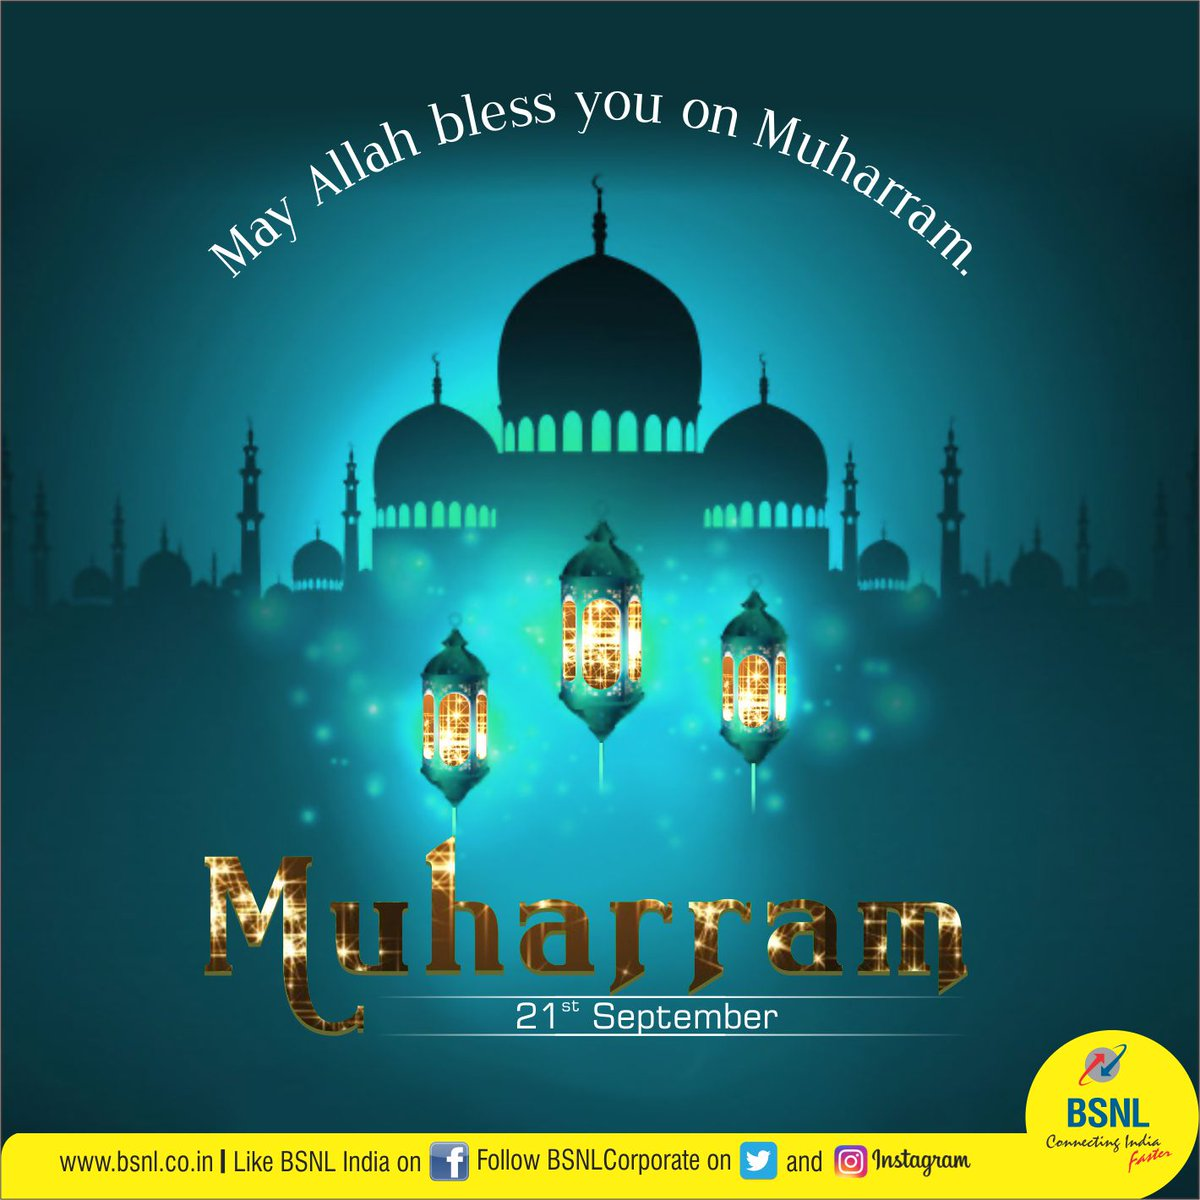 muharram2018 hashtag on Twitter